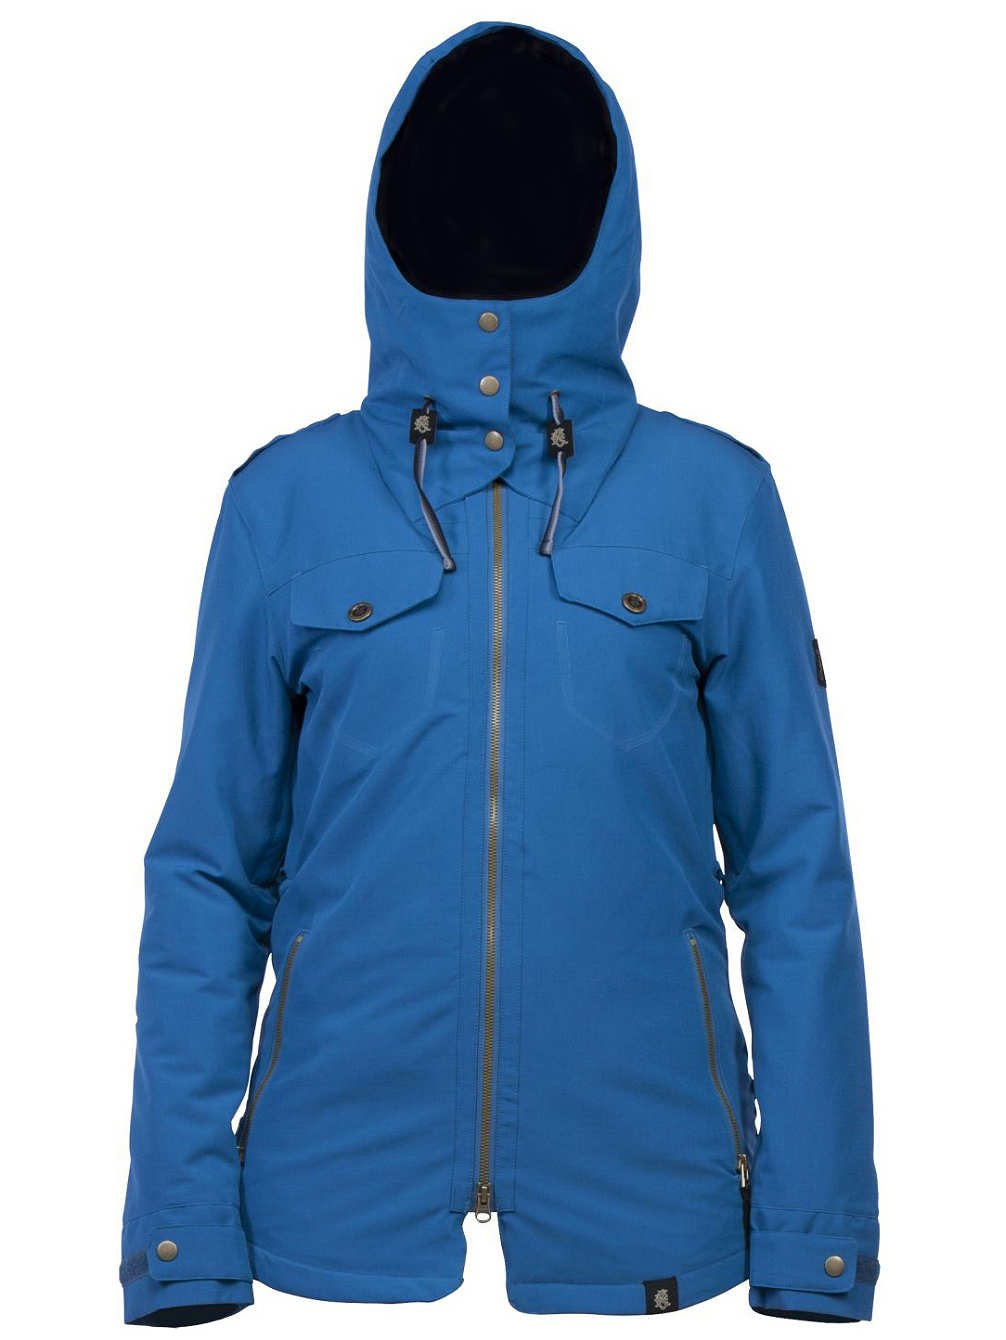 Cappel Damen Snowboard Jacke schwarzmail Jacket